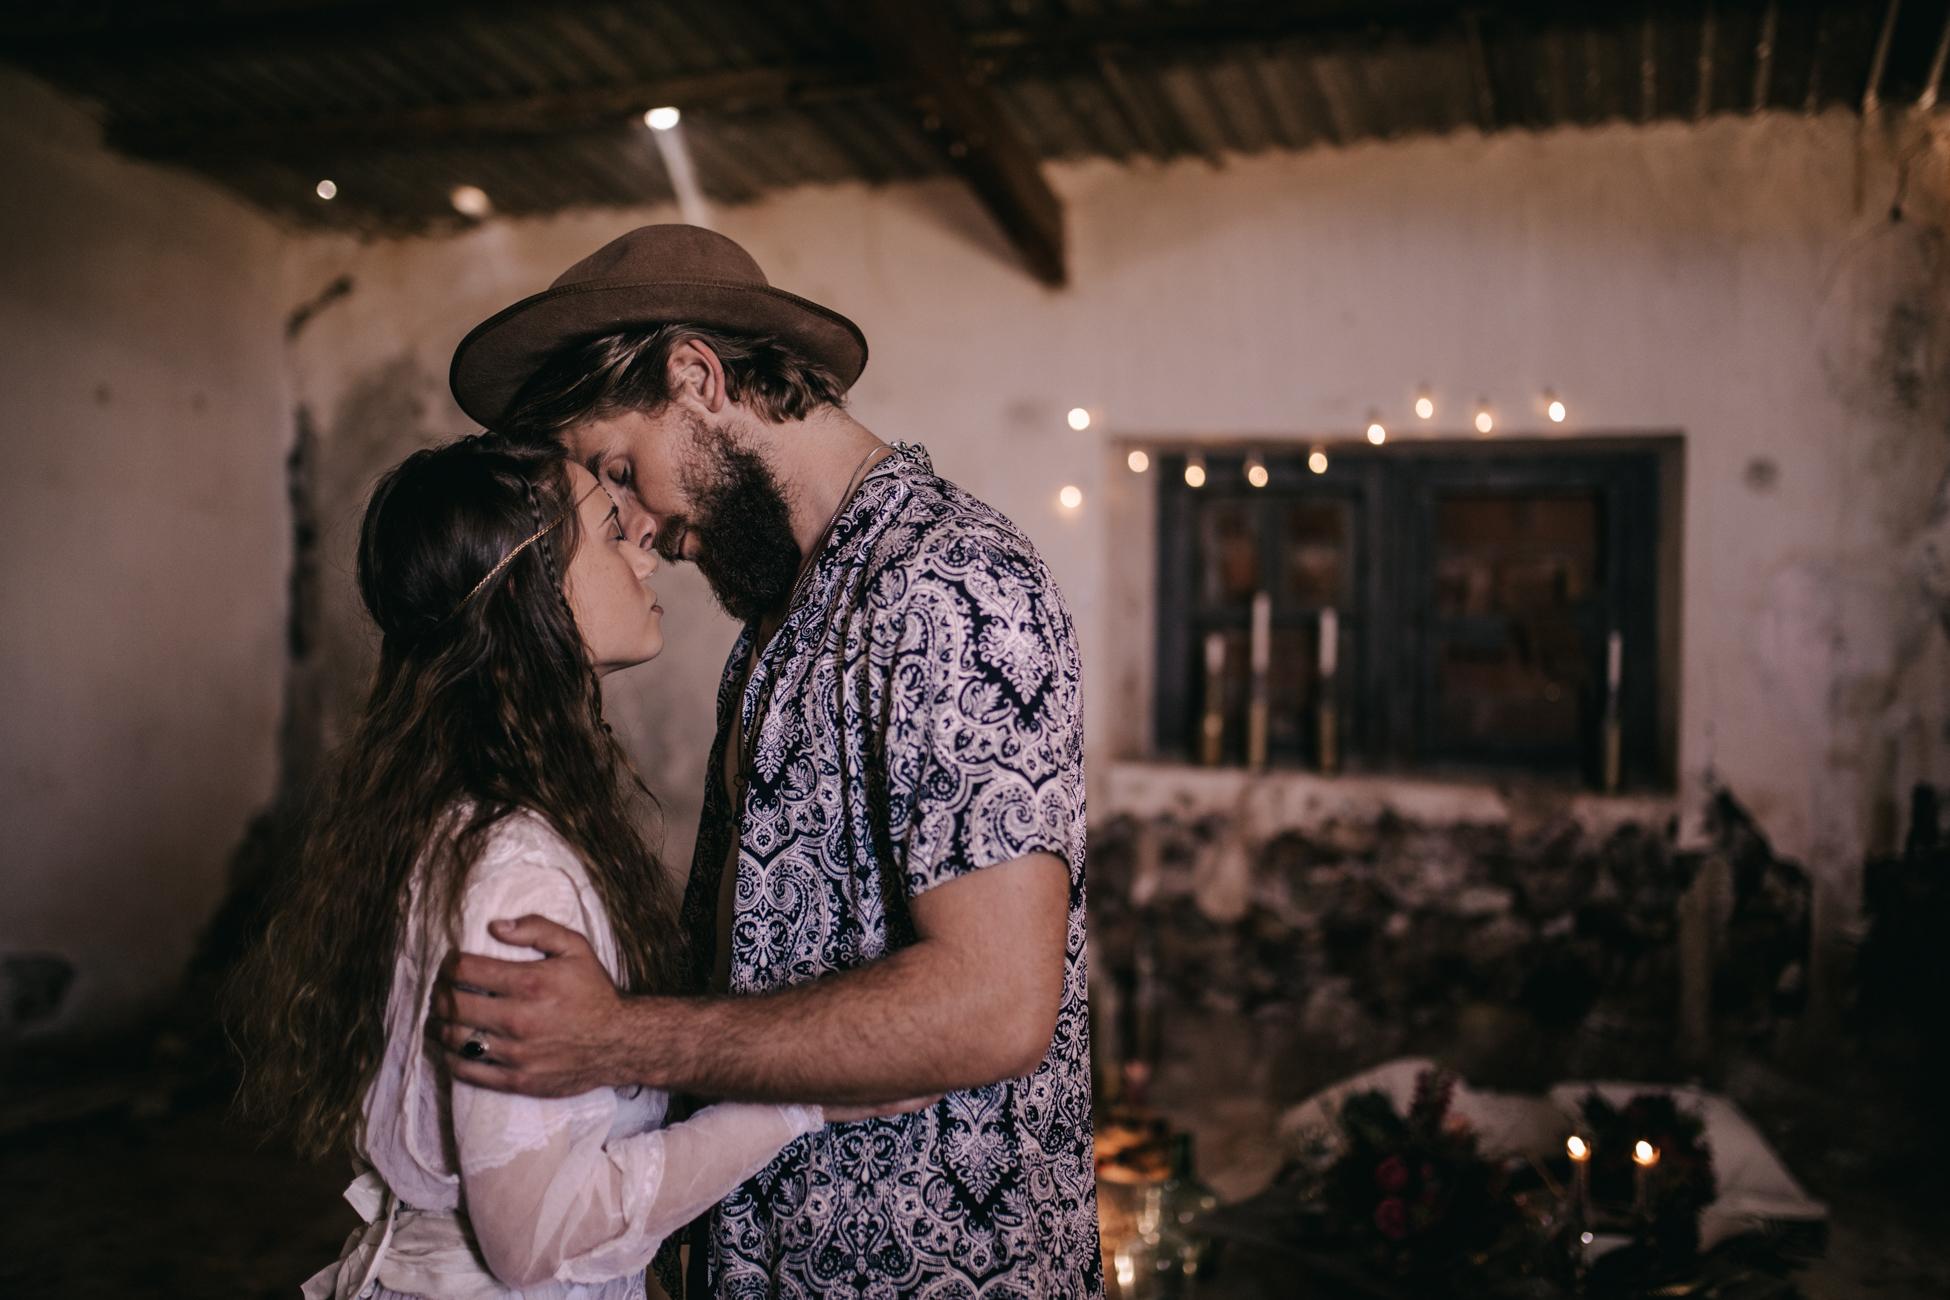 thenortherngirlphotography_photography_thenortherngirl_rebeccascabros_wedding_weddingphotography_weddingphotographer_wood_muebles_deco_bodasdecaramelo_home_bedtime_gaywedding_editorial_desierto_desert_wildestdreams_amortexano-227.jpg